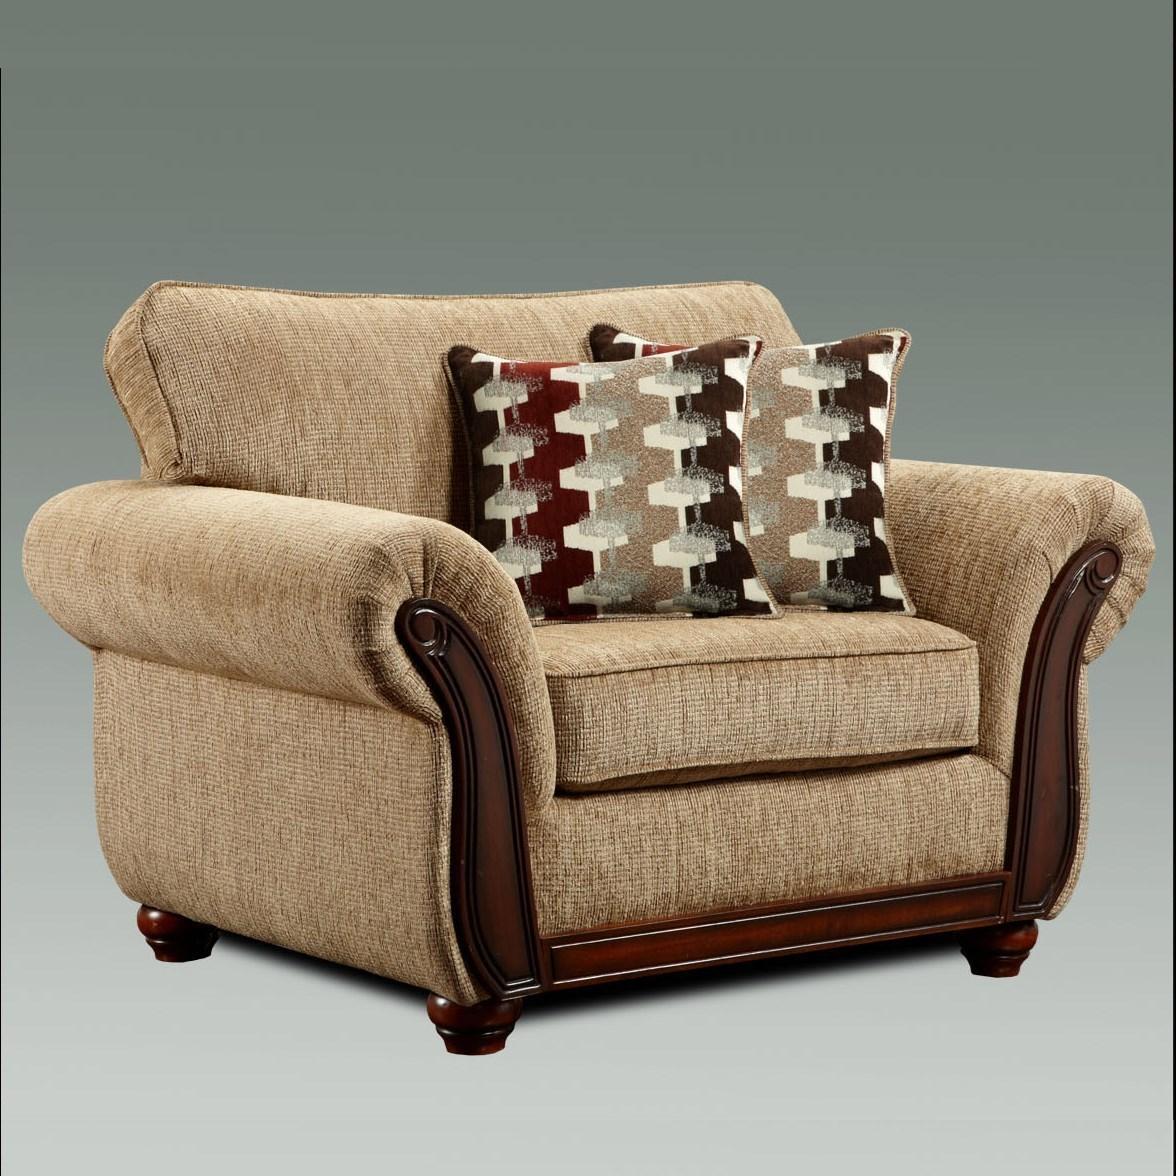 Washington Furniture 8100 Washington 8101 440 Traditional Upholstered Chair With Exposed Wood